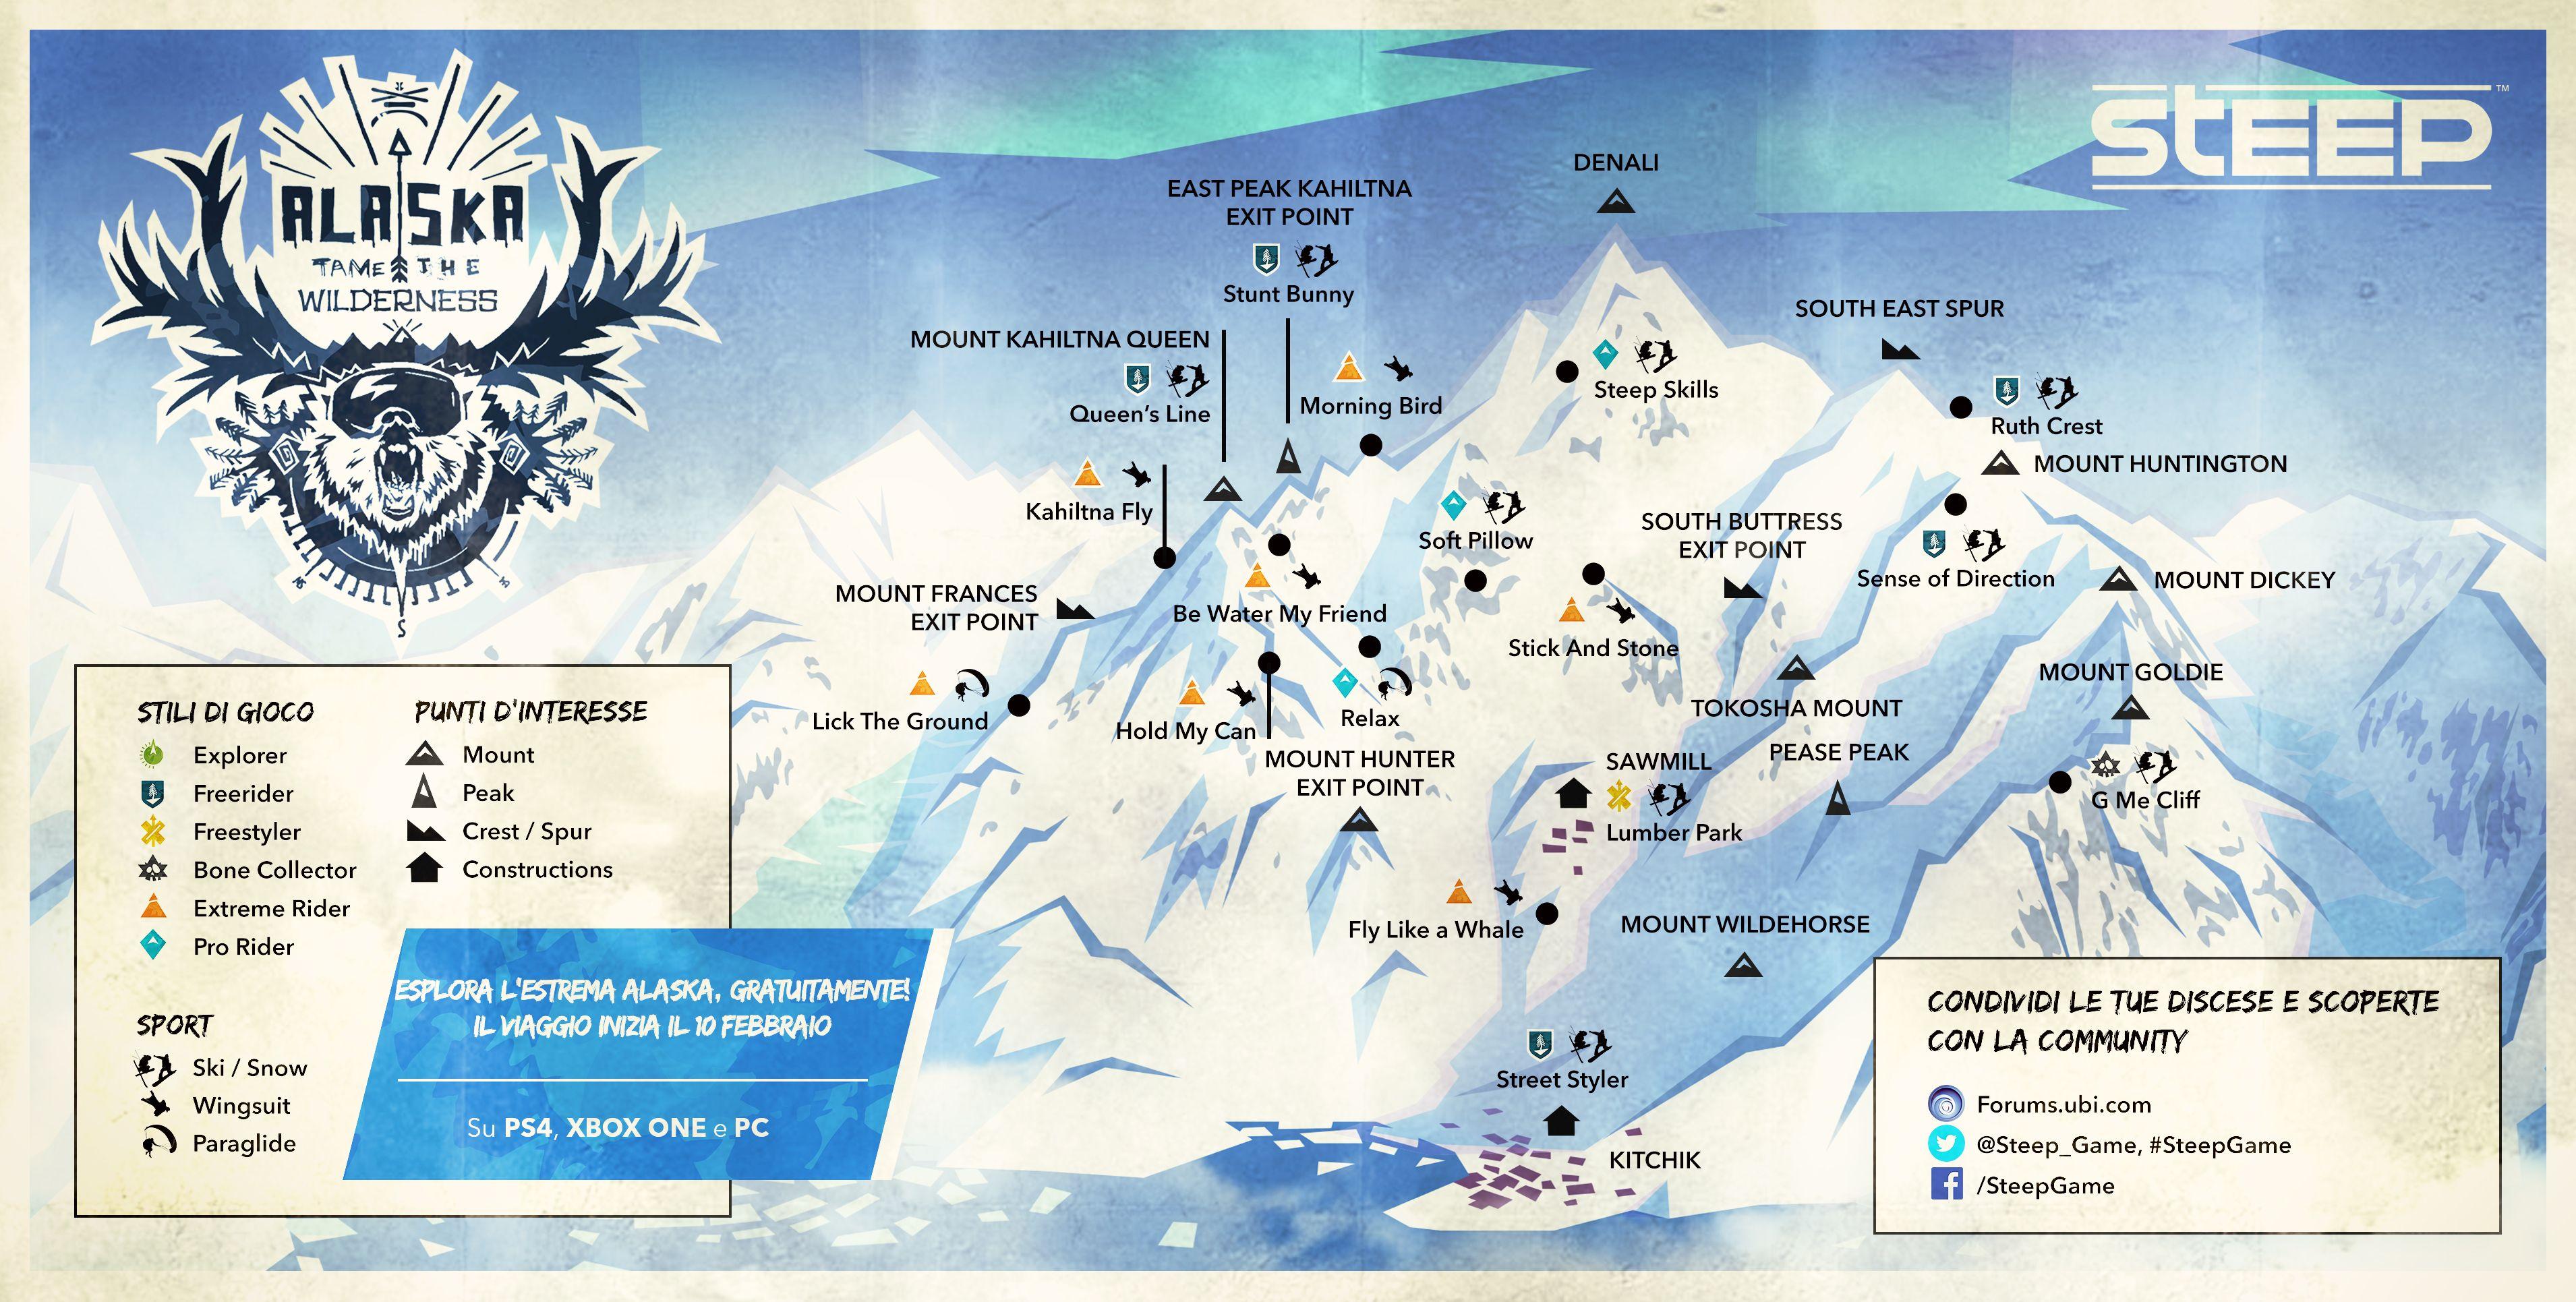 STEEP_ALASKA_map_PR_170127_2PM_CET-IT_1485446899